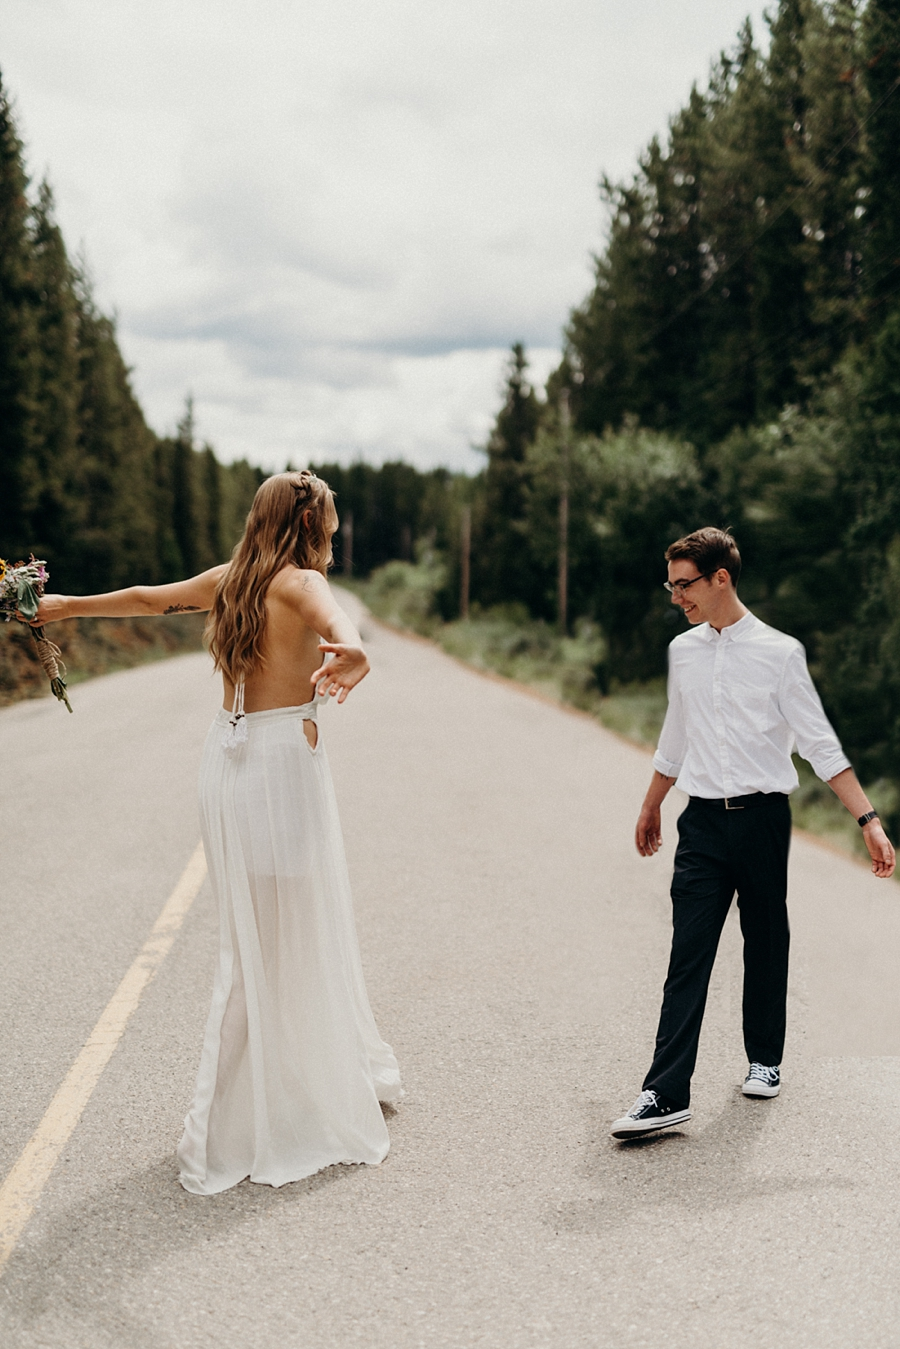 kaihla_tonai_intimate_wedding_elopement_photographer_7266.jpg